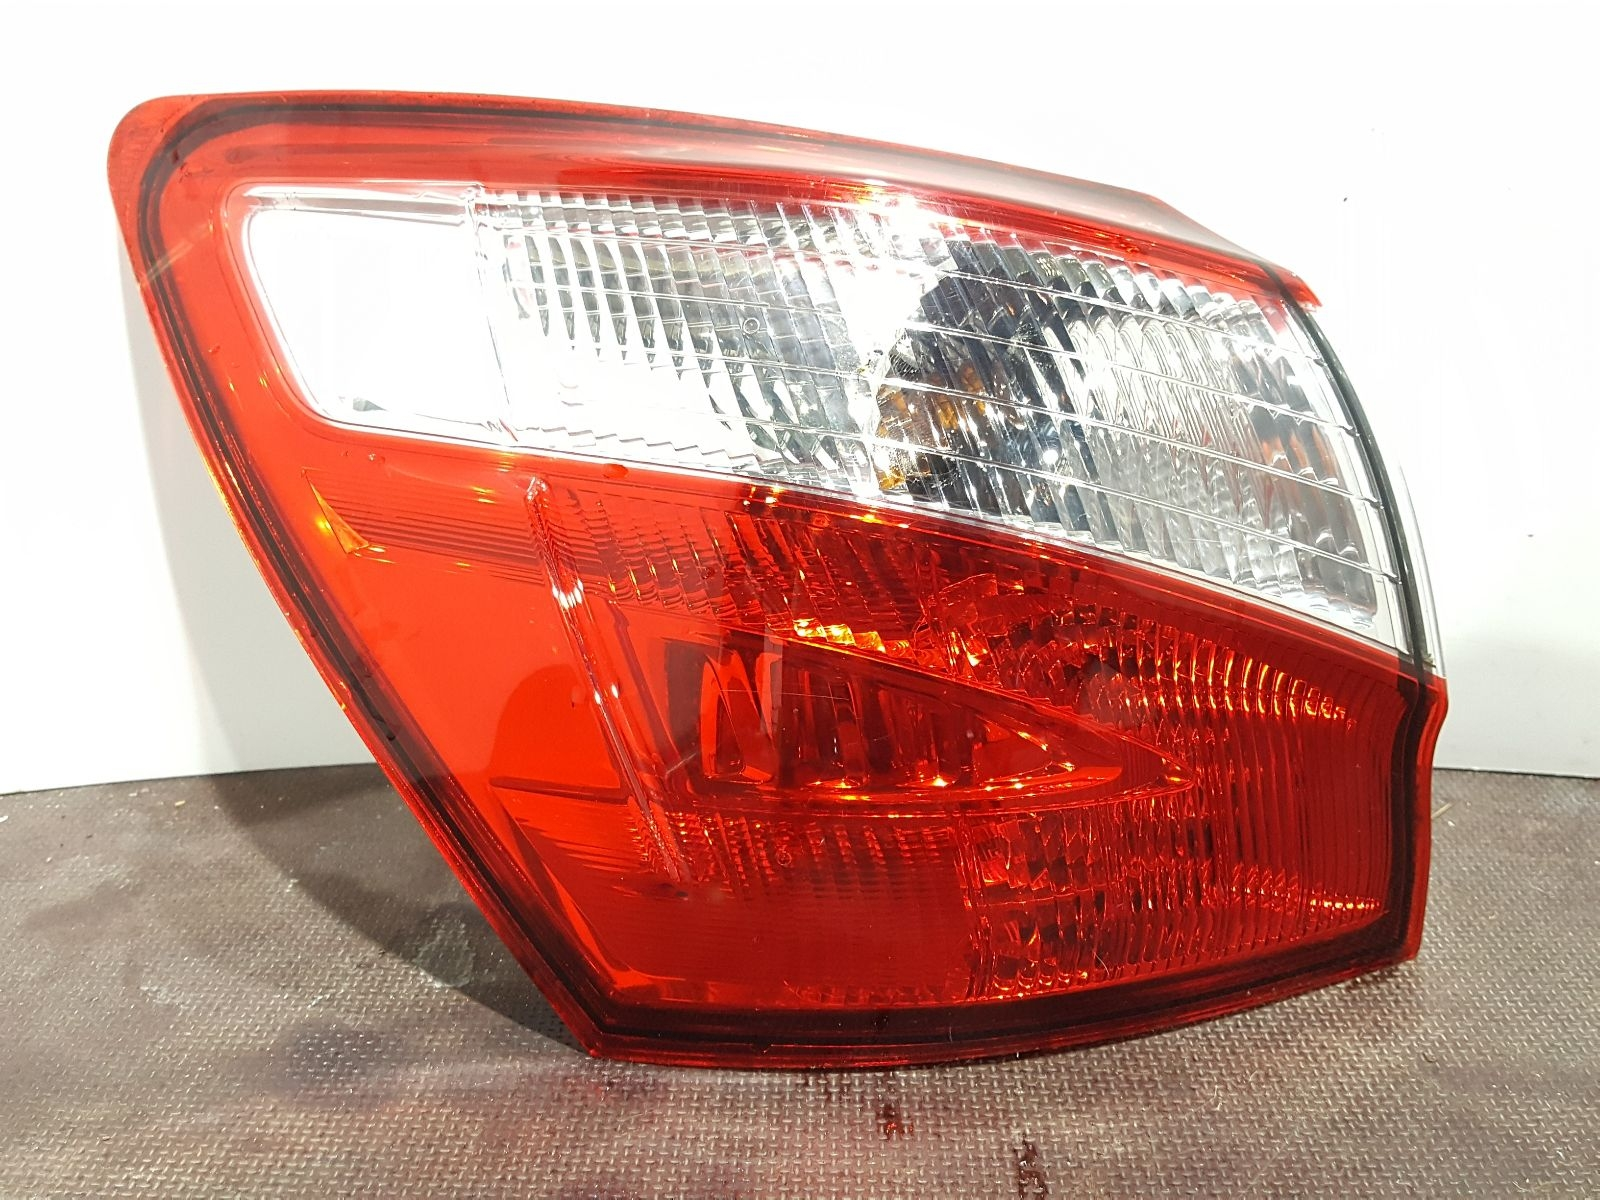 Nissan Qashqai 2010 To 2013 N/S Left Passengers Rear Light